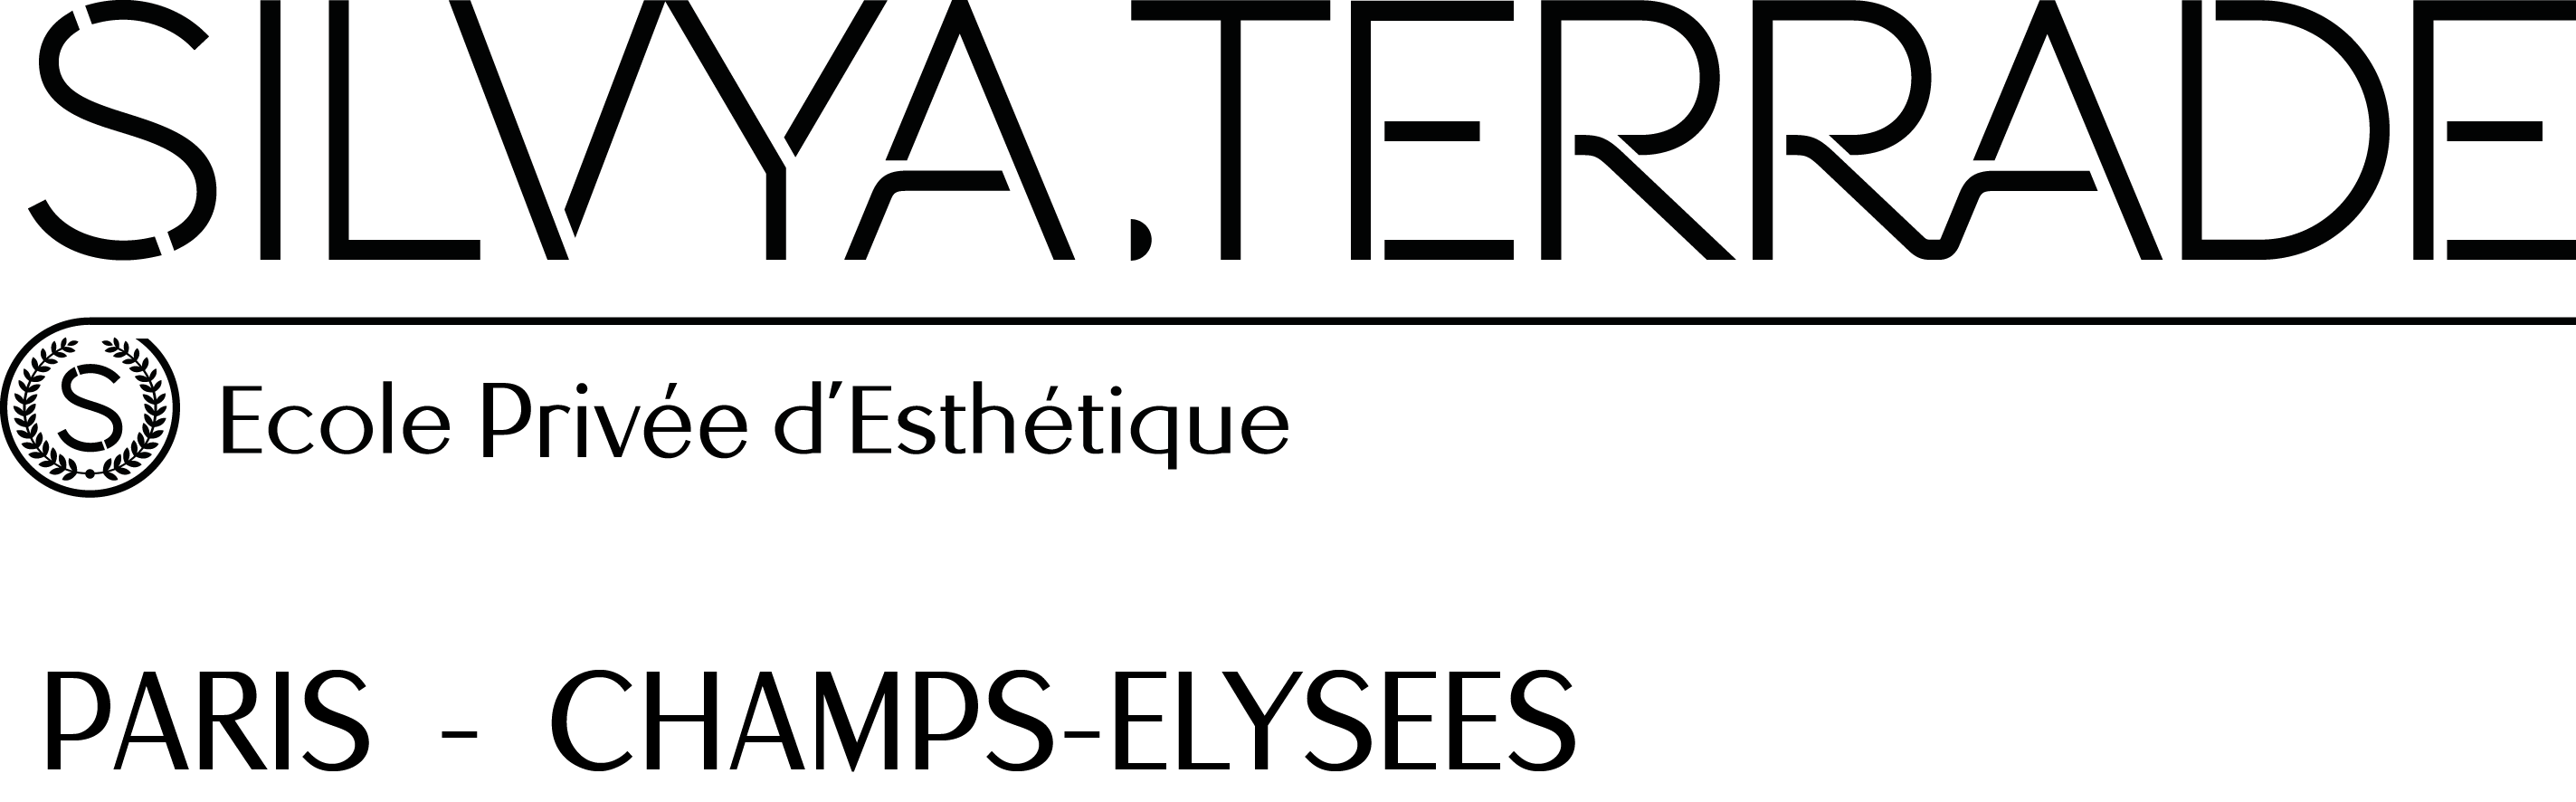 Logo SILVYA TERRADE PARIS CHAMPS-ELYSEES